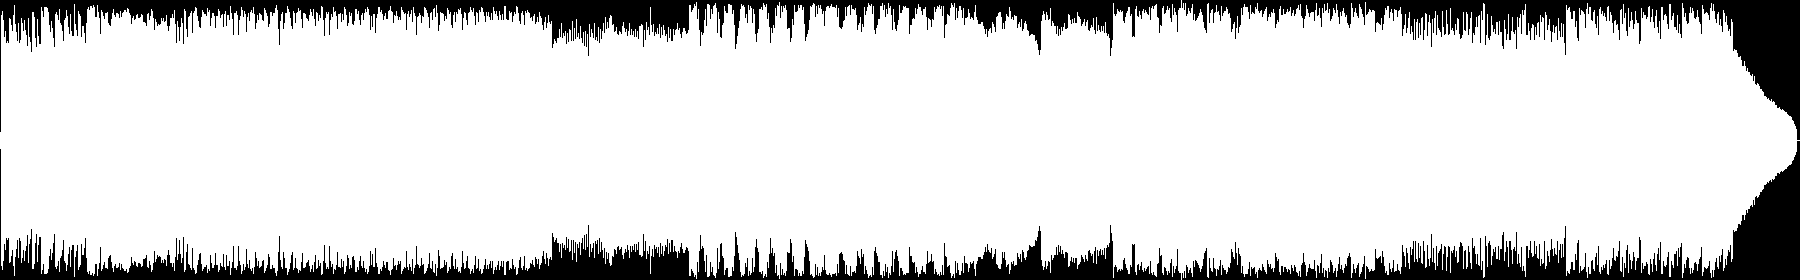 Serum Preset Megapack audio waveform